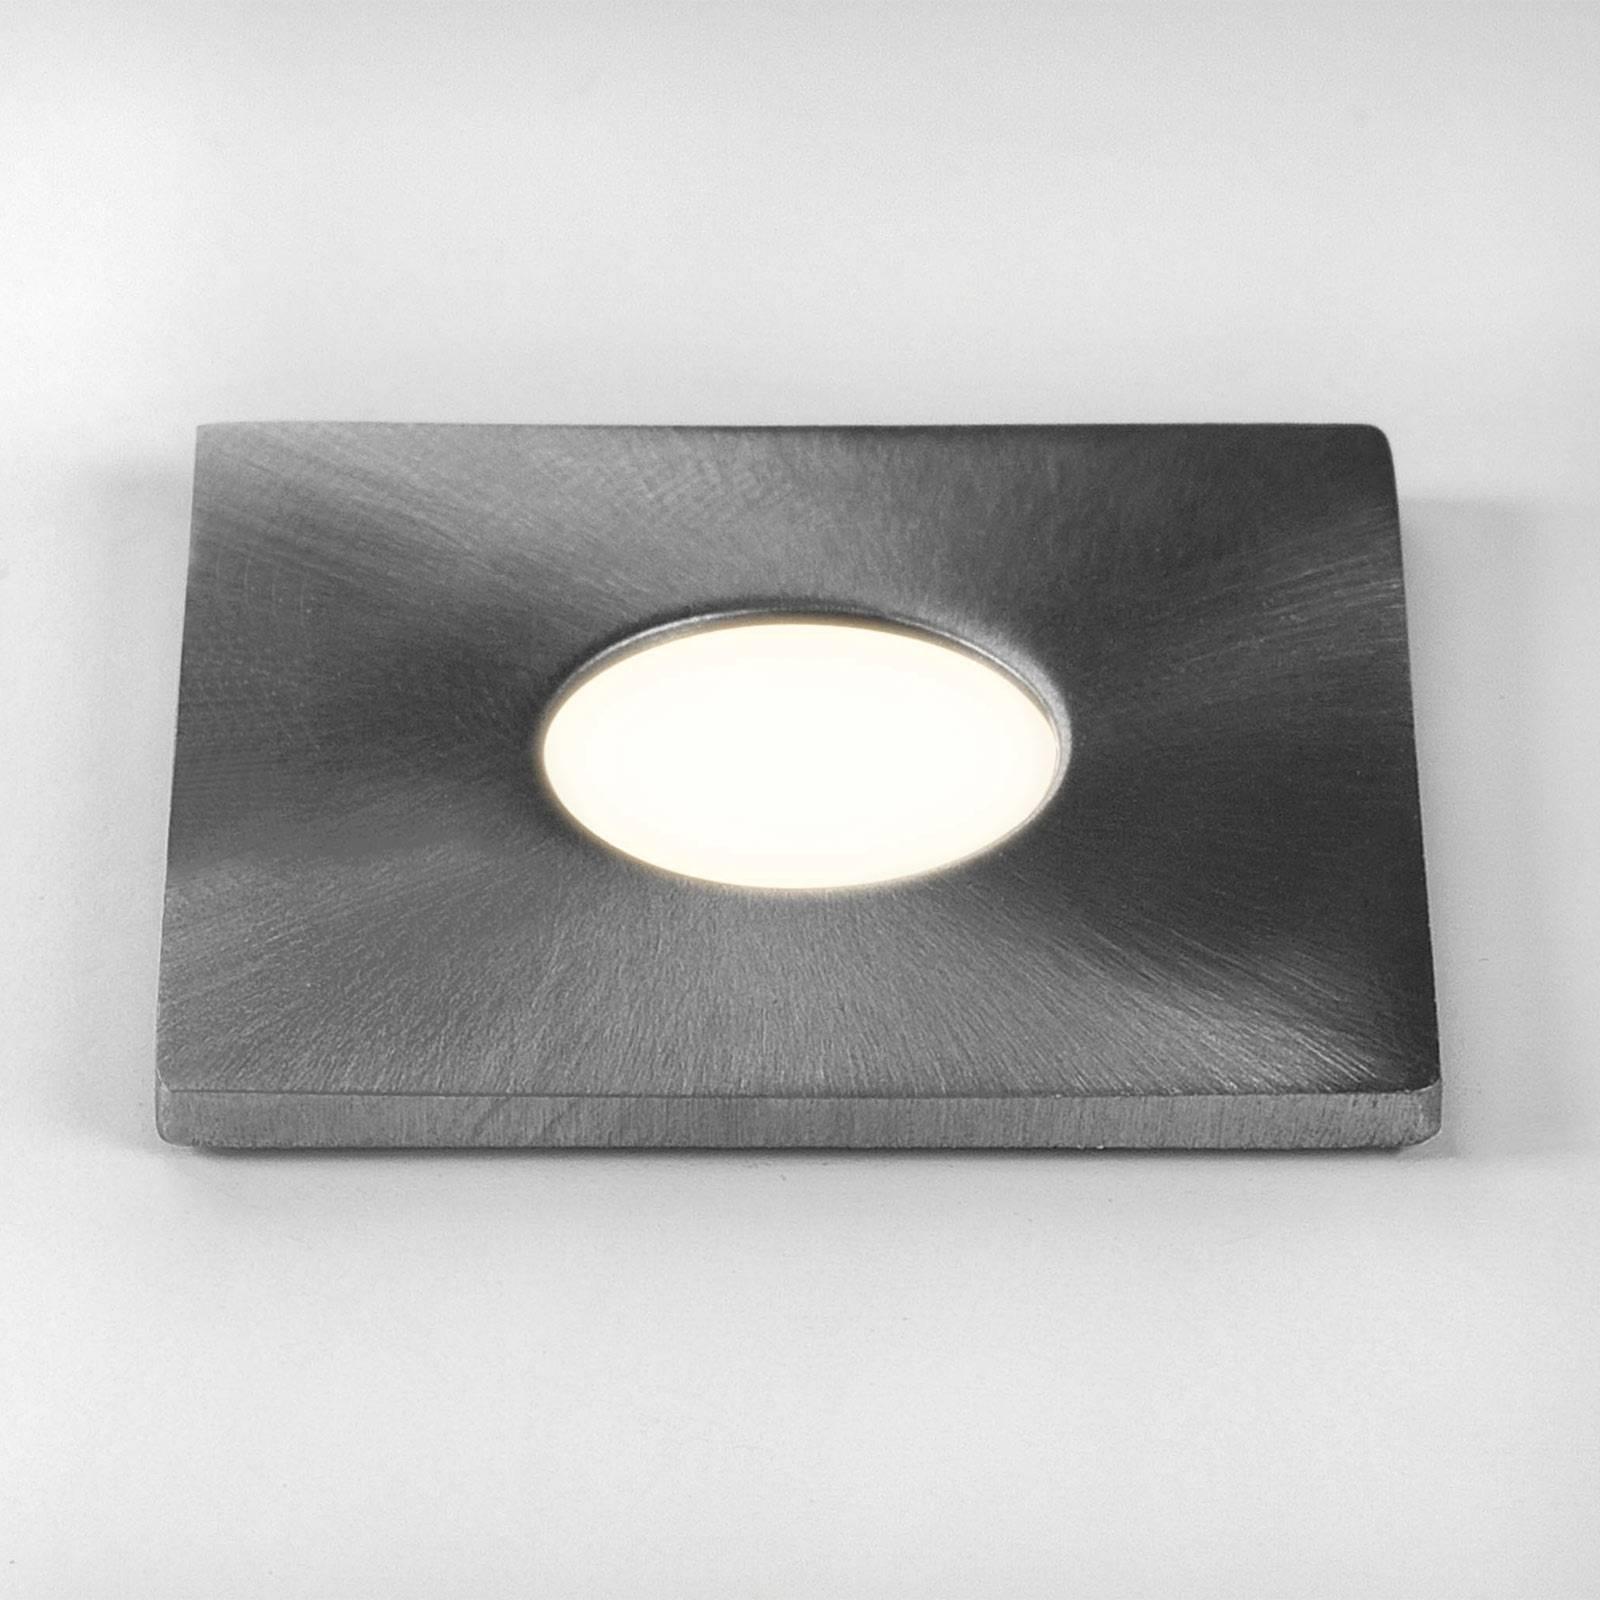 Astro Terra 28 Square -LED-uppovalaisin, IP65